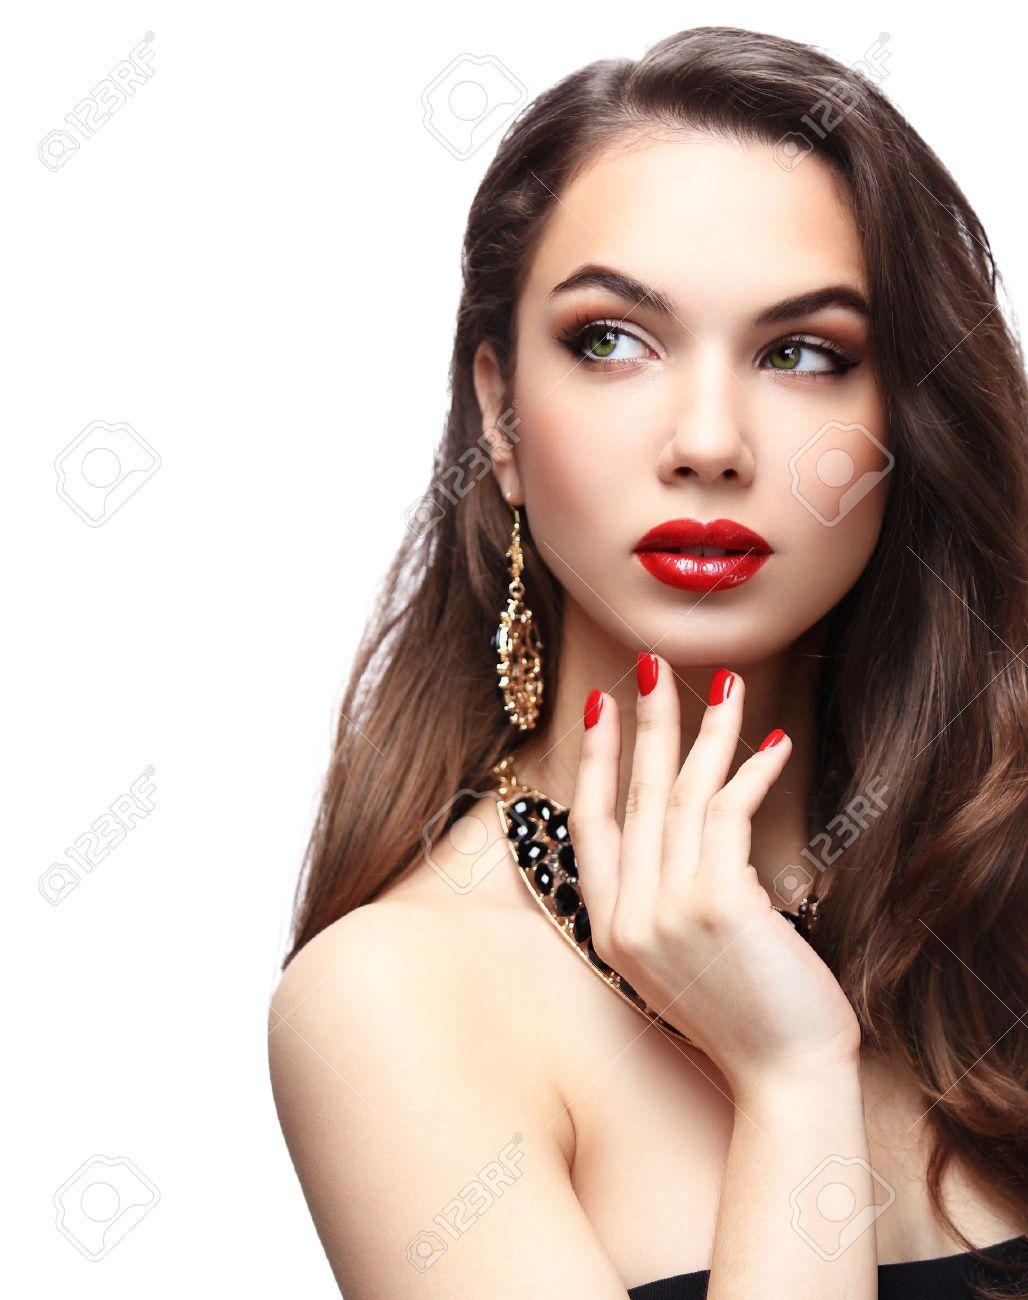 modelo maquillaje